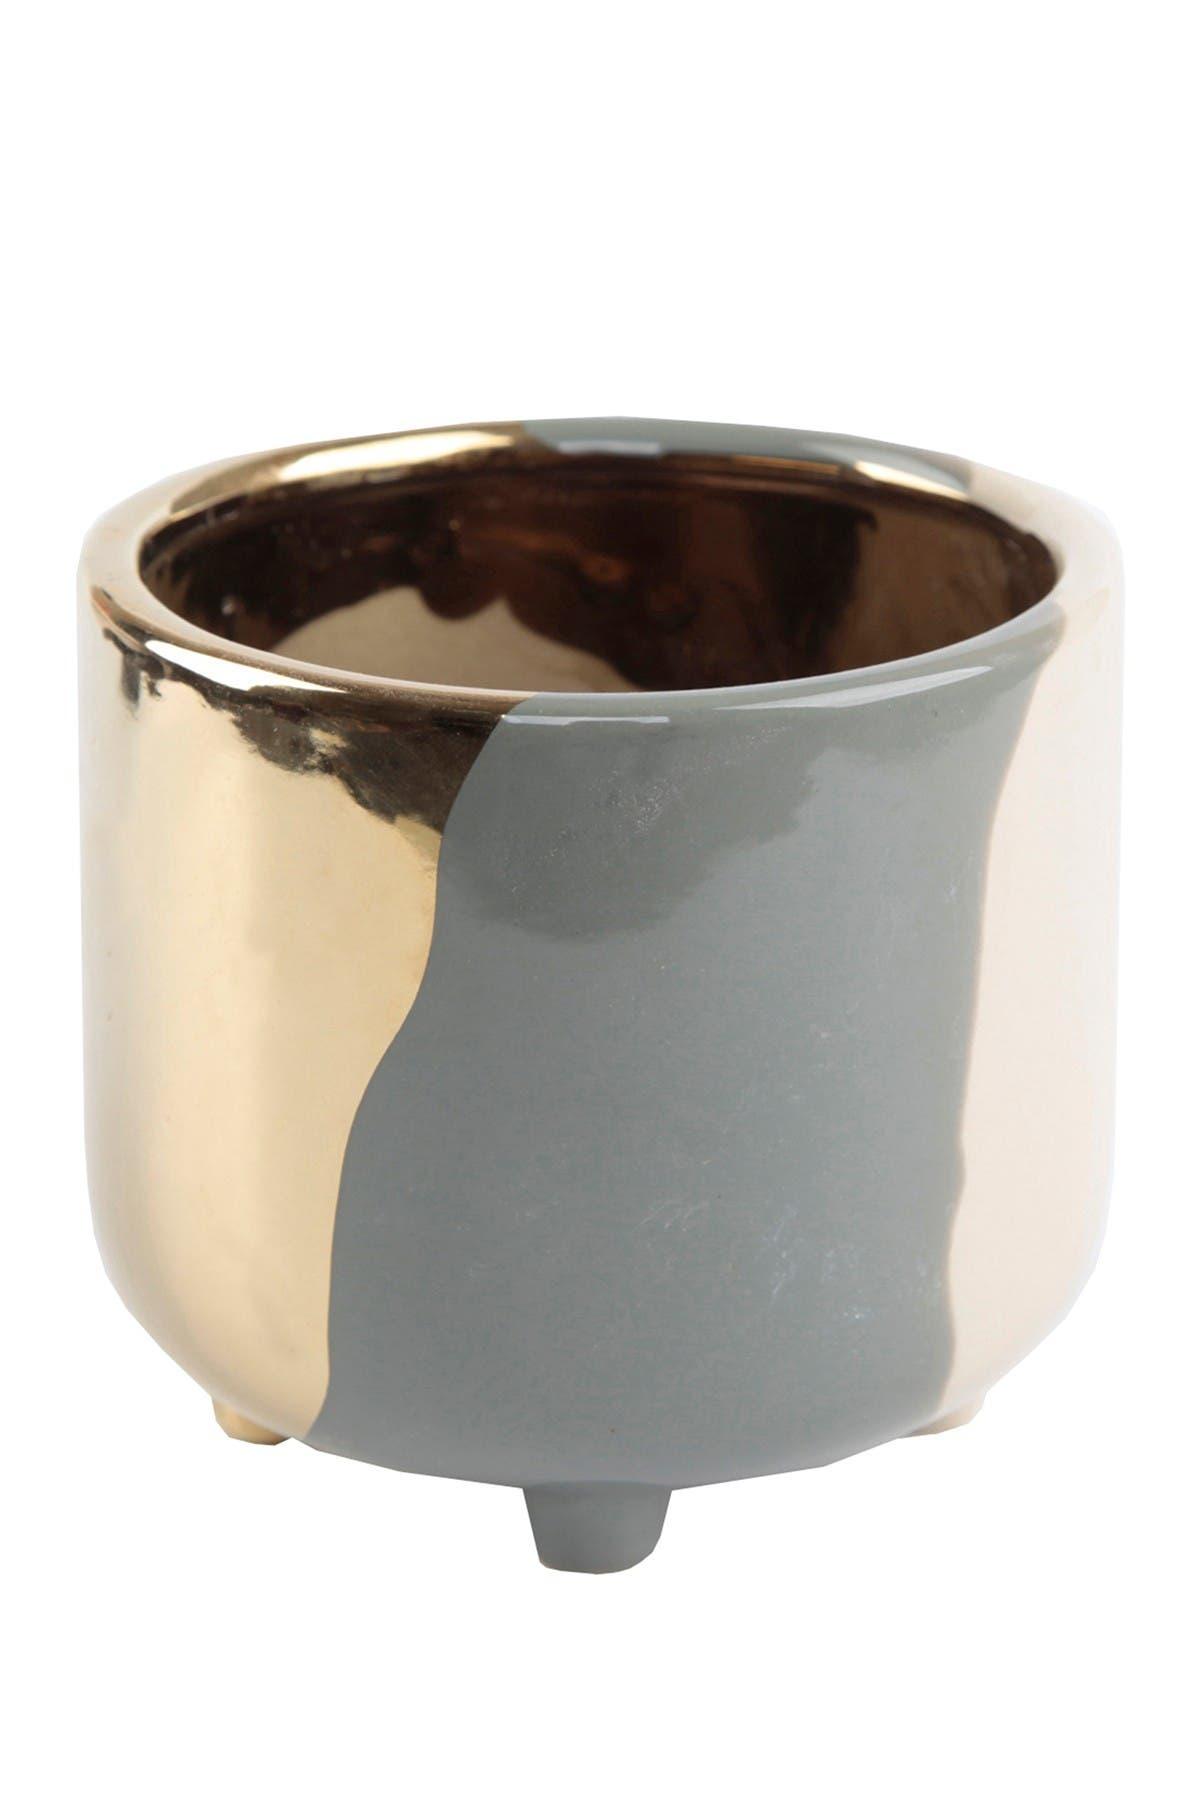 "Image of FLORA BUNDA 4.8"" Multicolor Footed Ceramic Planter"